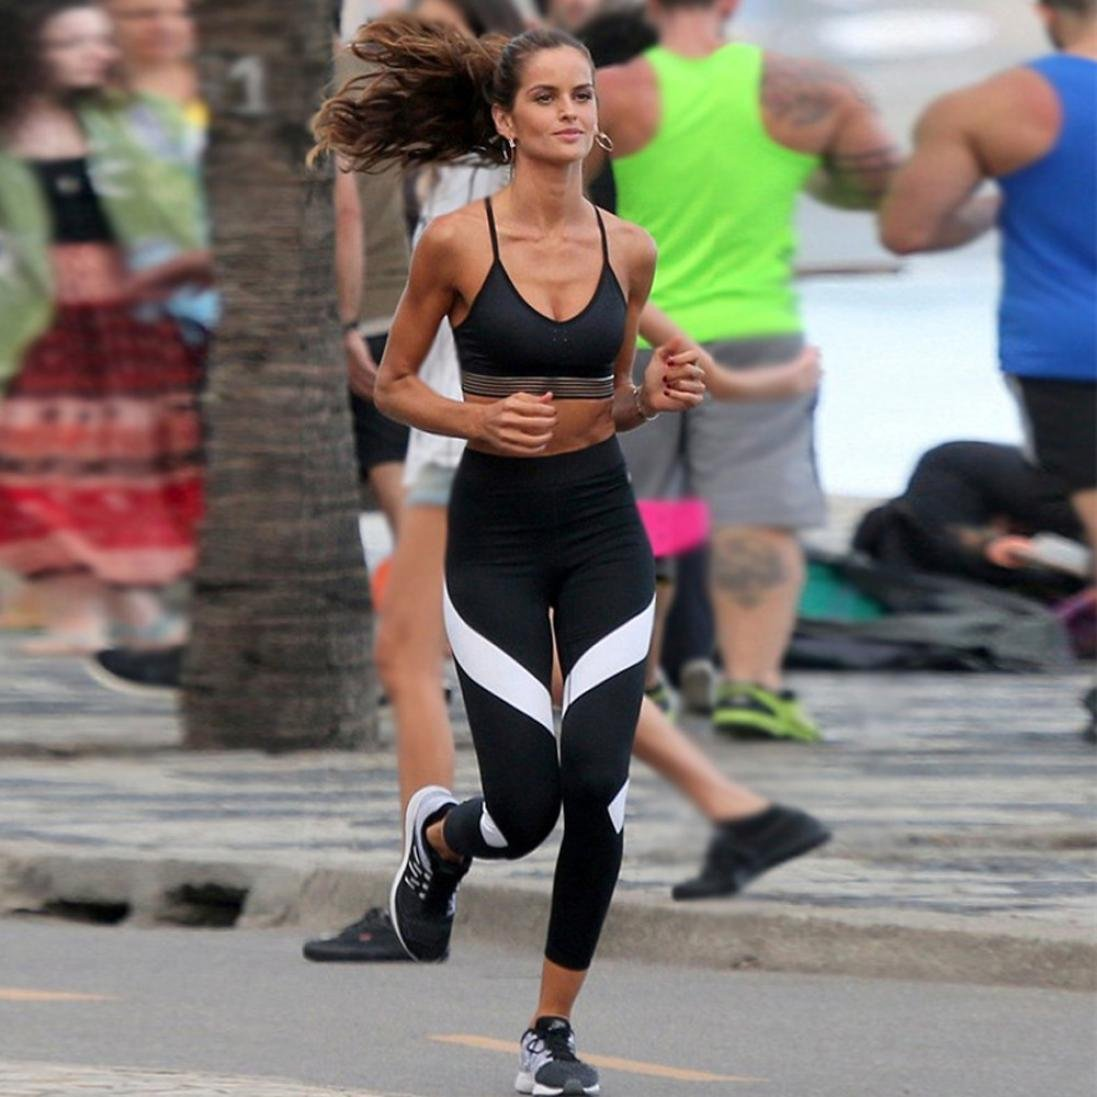 Pantalones Yoga Mujeres, ❤️Xinantime Pantalones de yoga empalme para mujer Skinny Gym Leggings de entrenamiento Pantalones recortados deportivos: ...